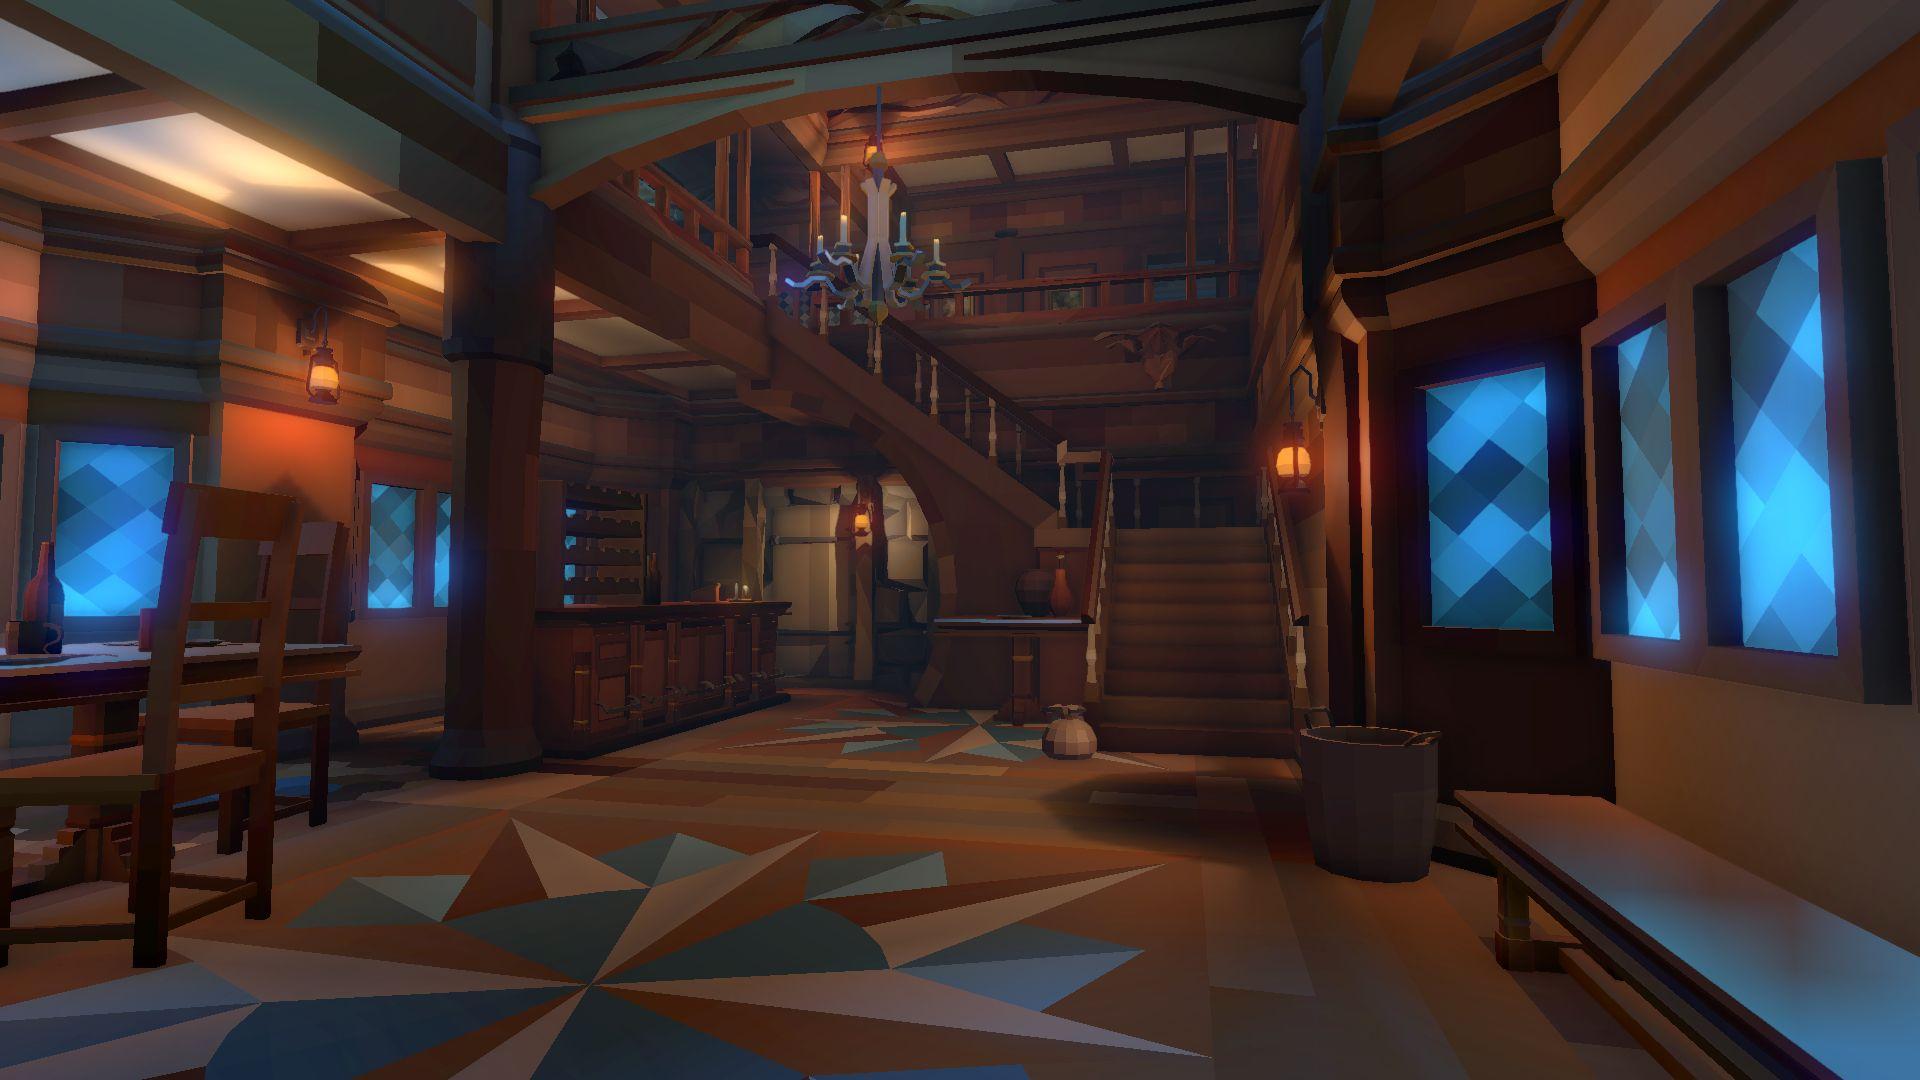 Fantasy Interiors Polyworld Low Poly Tools And 3d Art